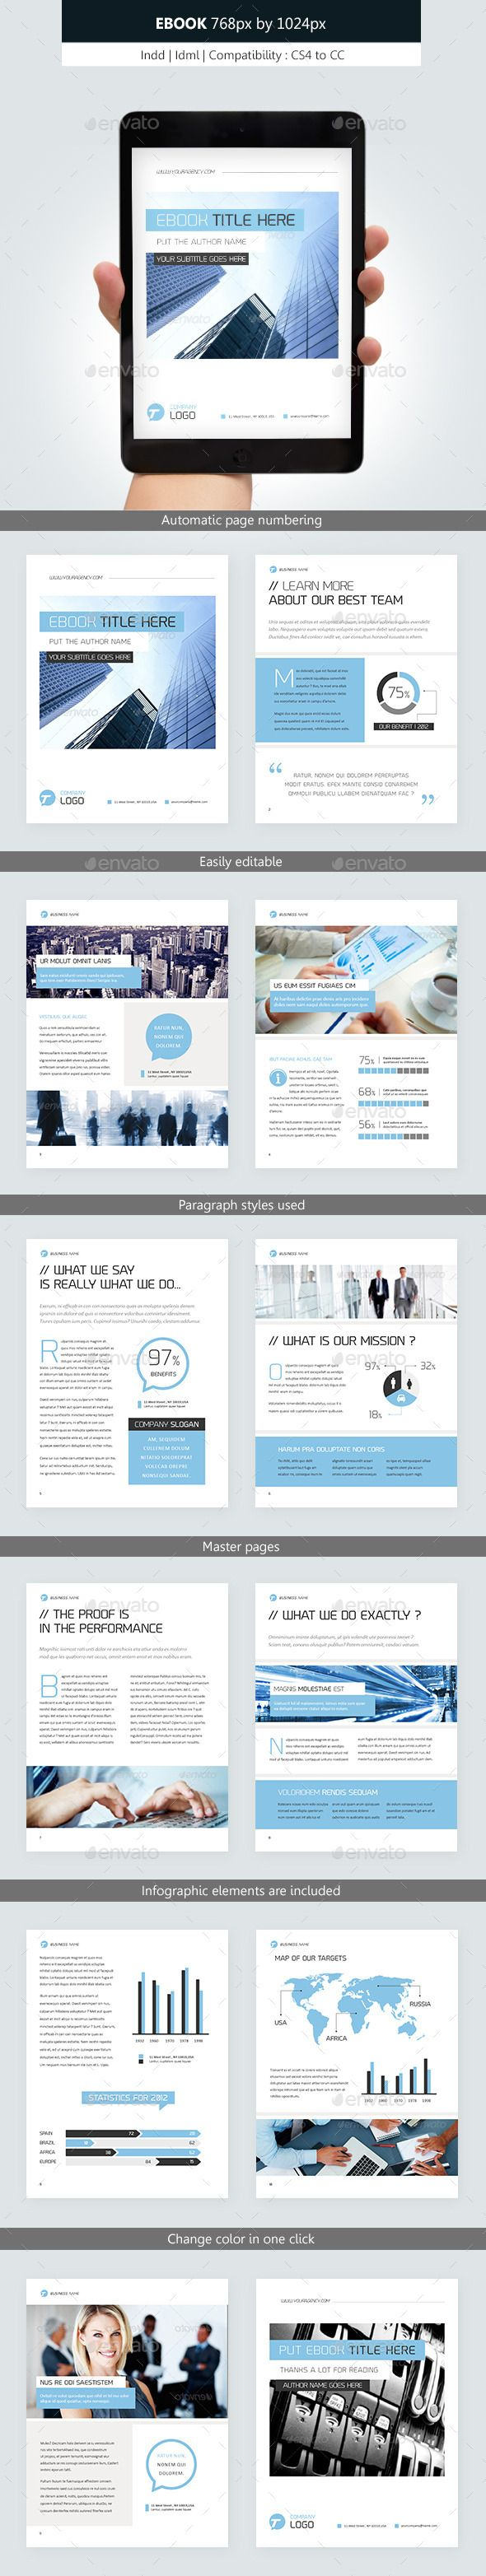 Corporate Ebook Template Design vol.2